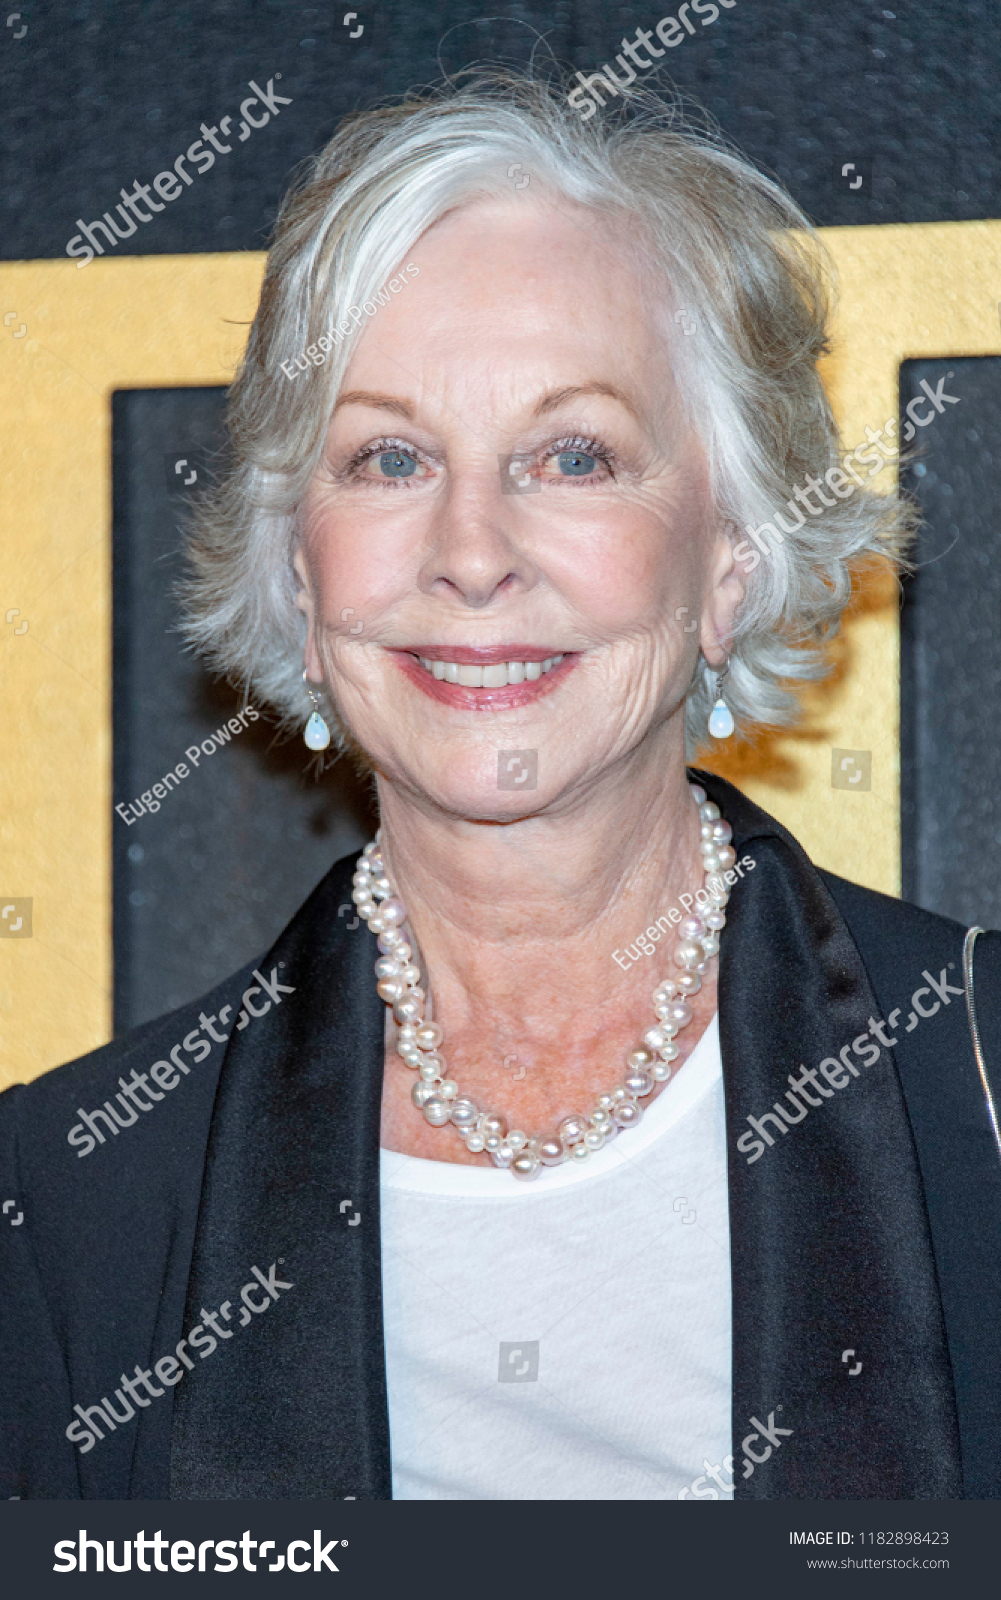 Robin Duke,Betty Aberlin Hot image Alice Patten,David Tennant (born 1971)